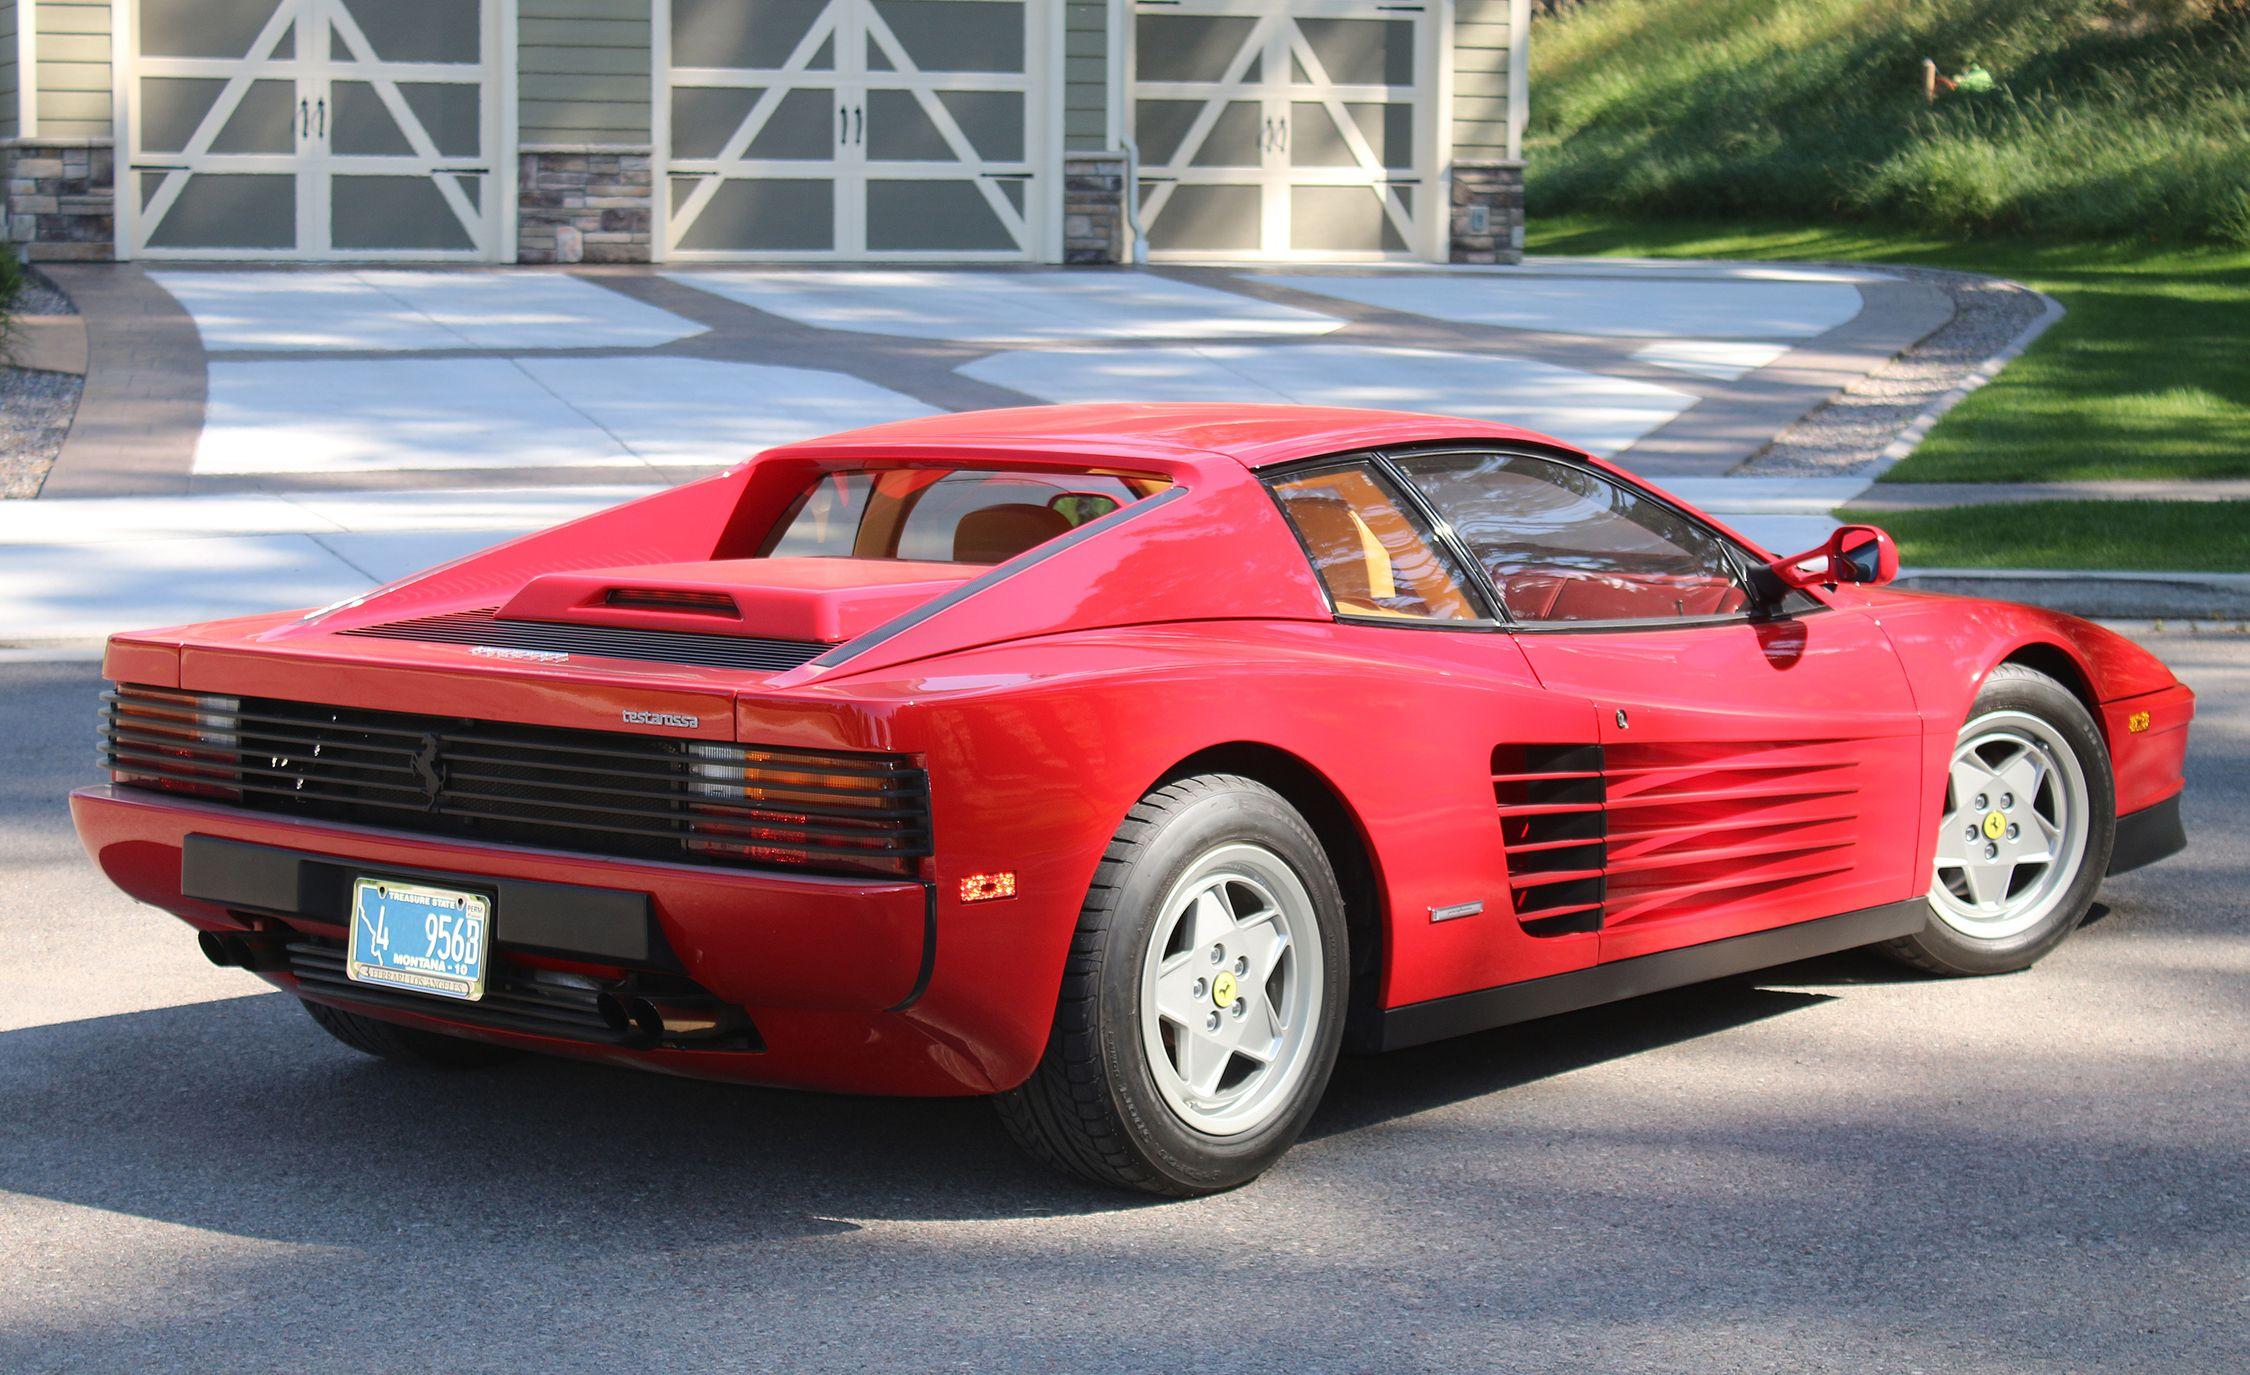 Esta es la Ferrari Testarossa